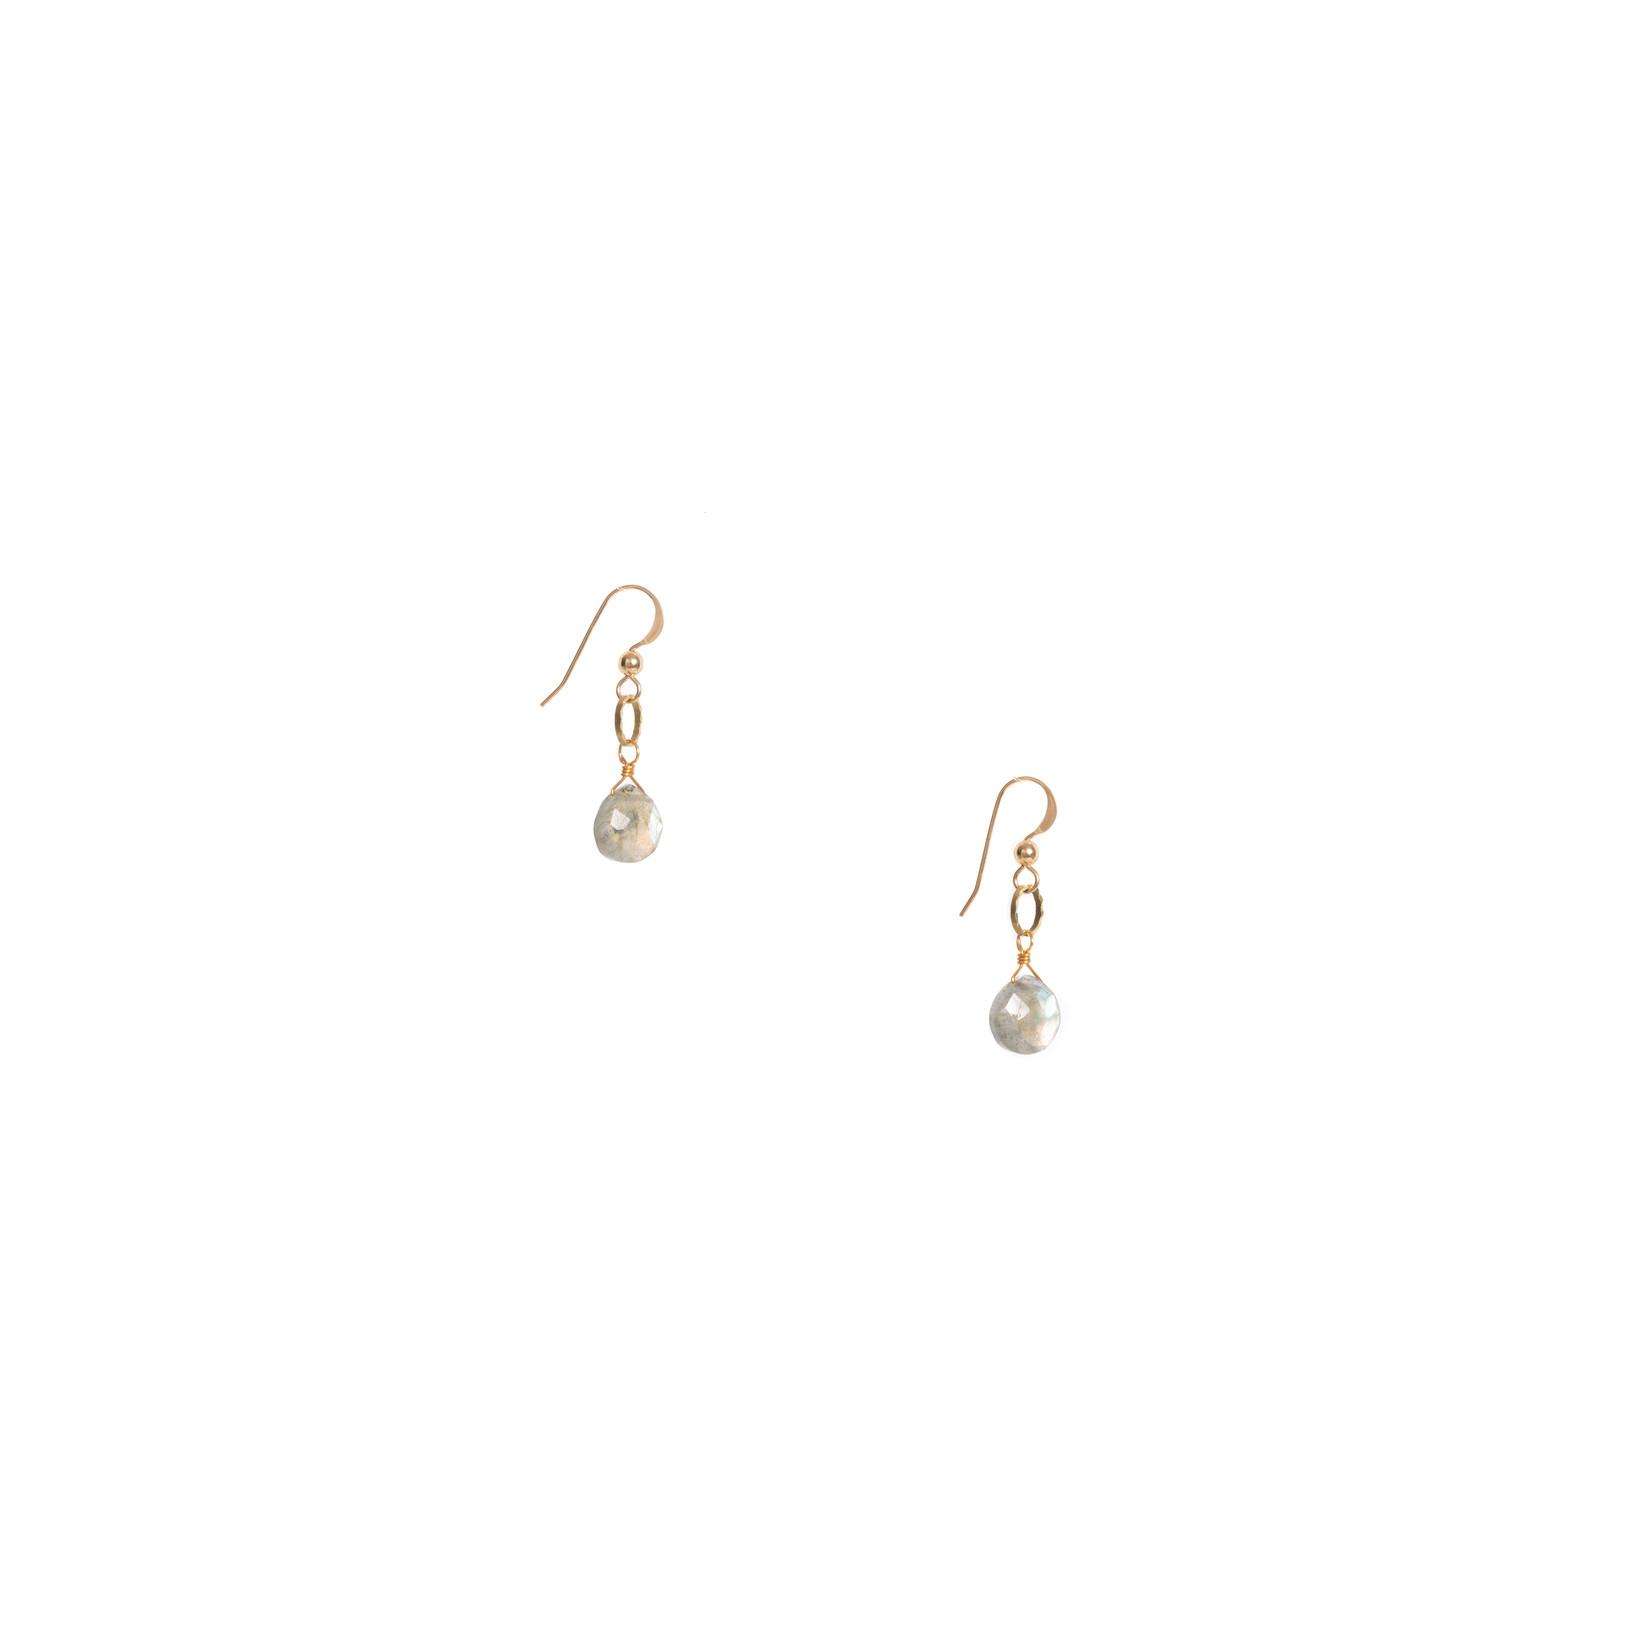 Hailey Gerrits Classic Sidra Earrings